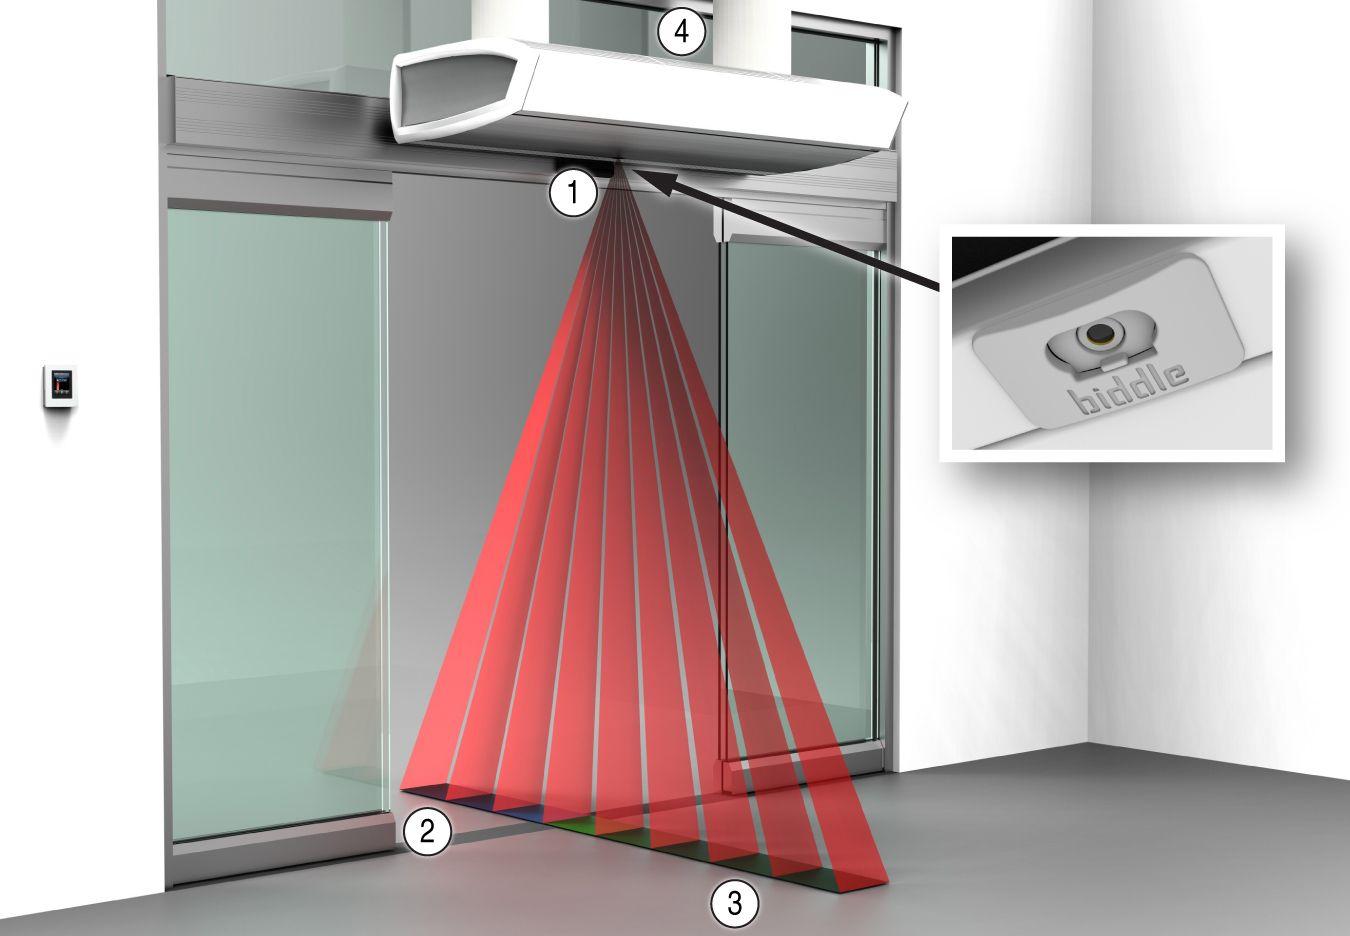 Patented i-sense infrared technology